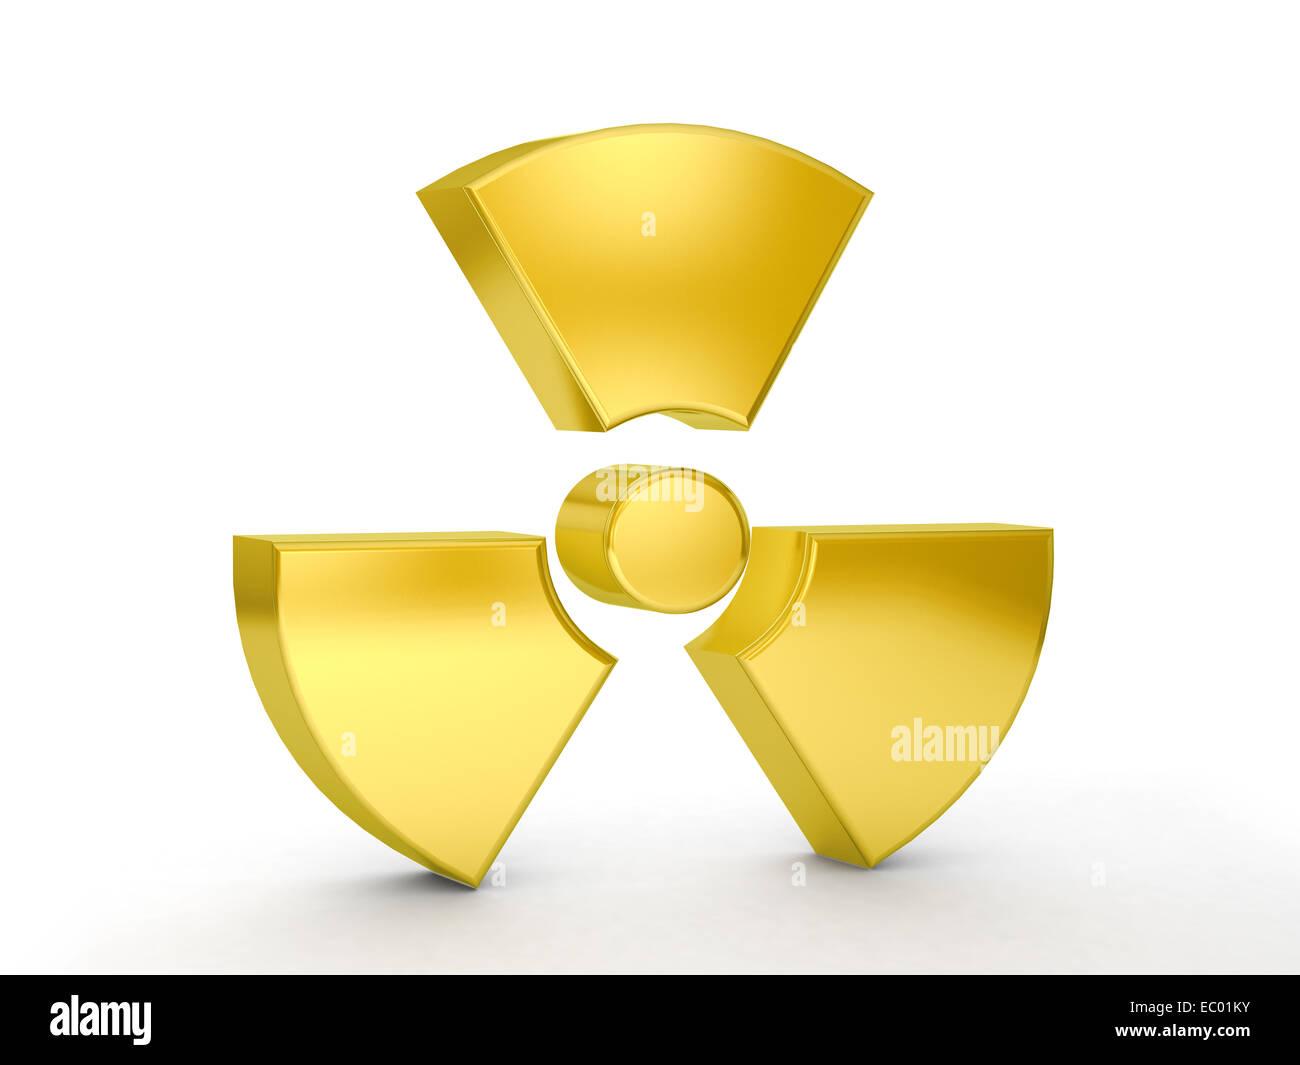 Gold radiation symbol on a white background. - Stock Image